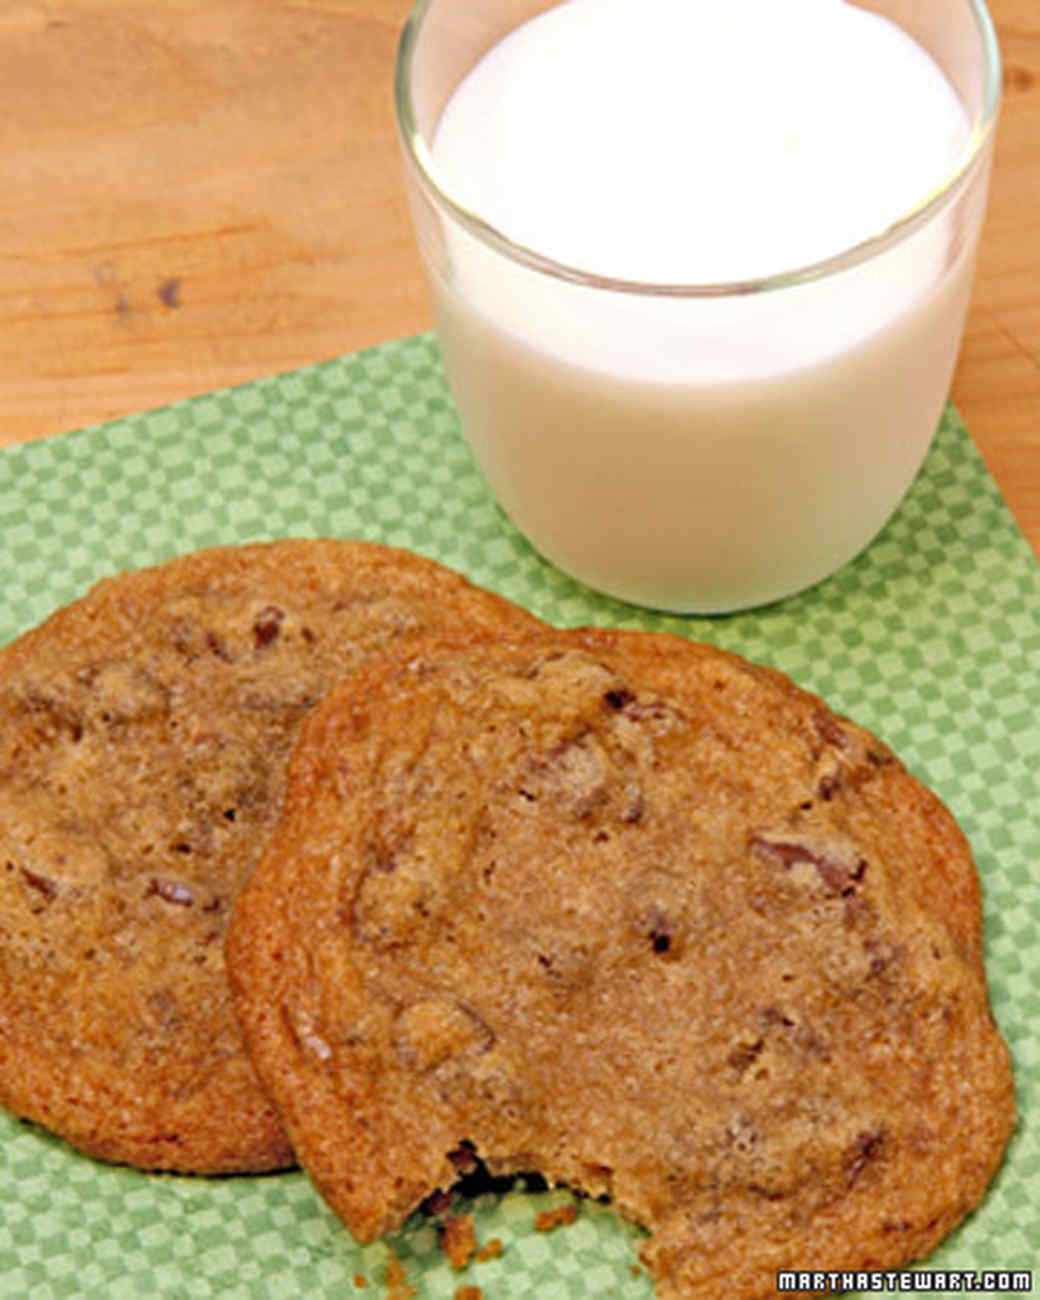 Chocolate chip cookie recipes martha stewart - Coocke Recipes